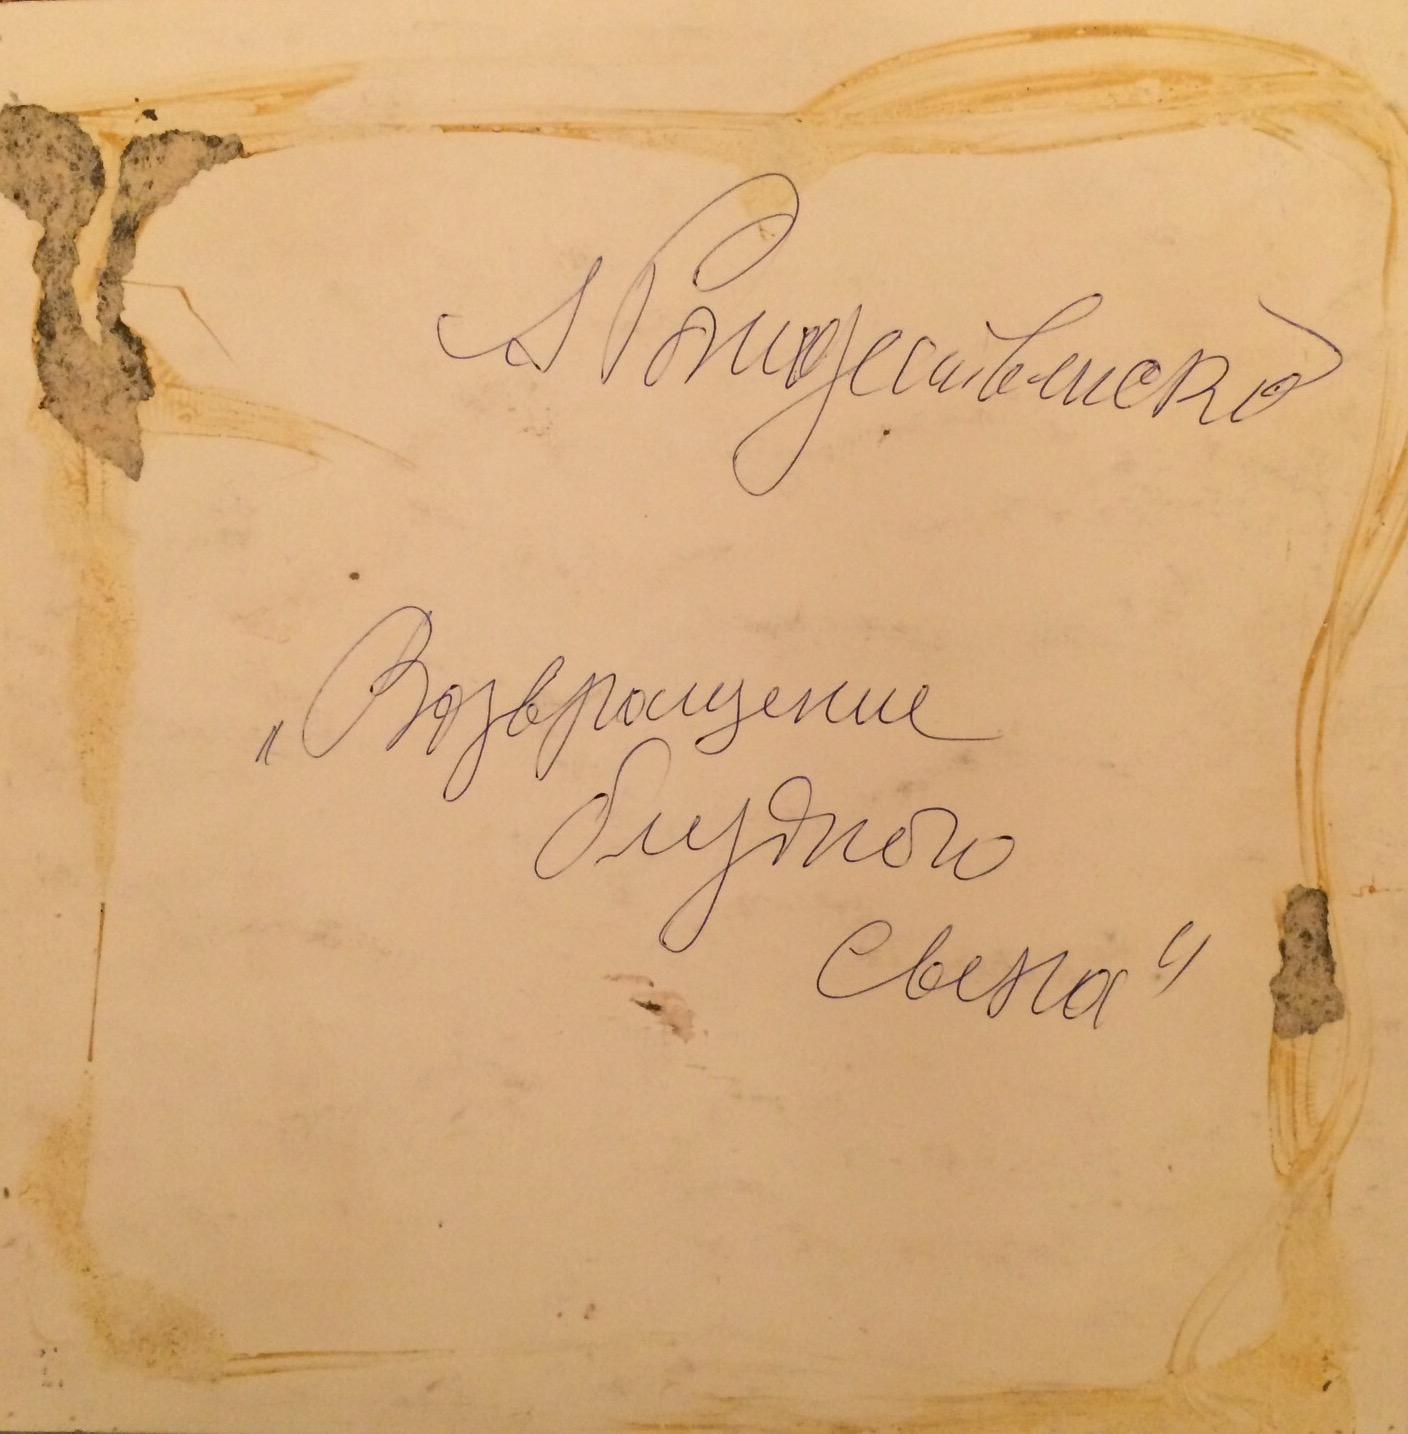 Оборот. Рождественский Александр Илларионович. Возвращение блудного сына.